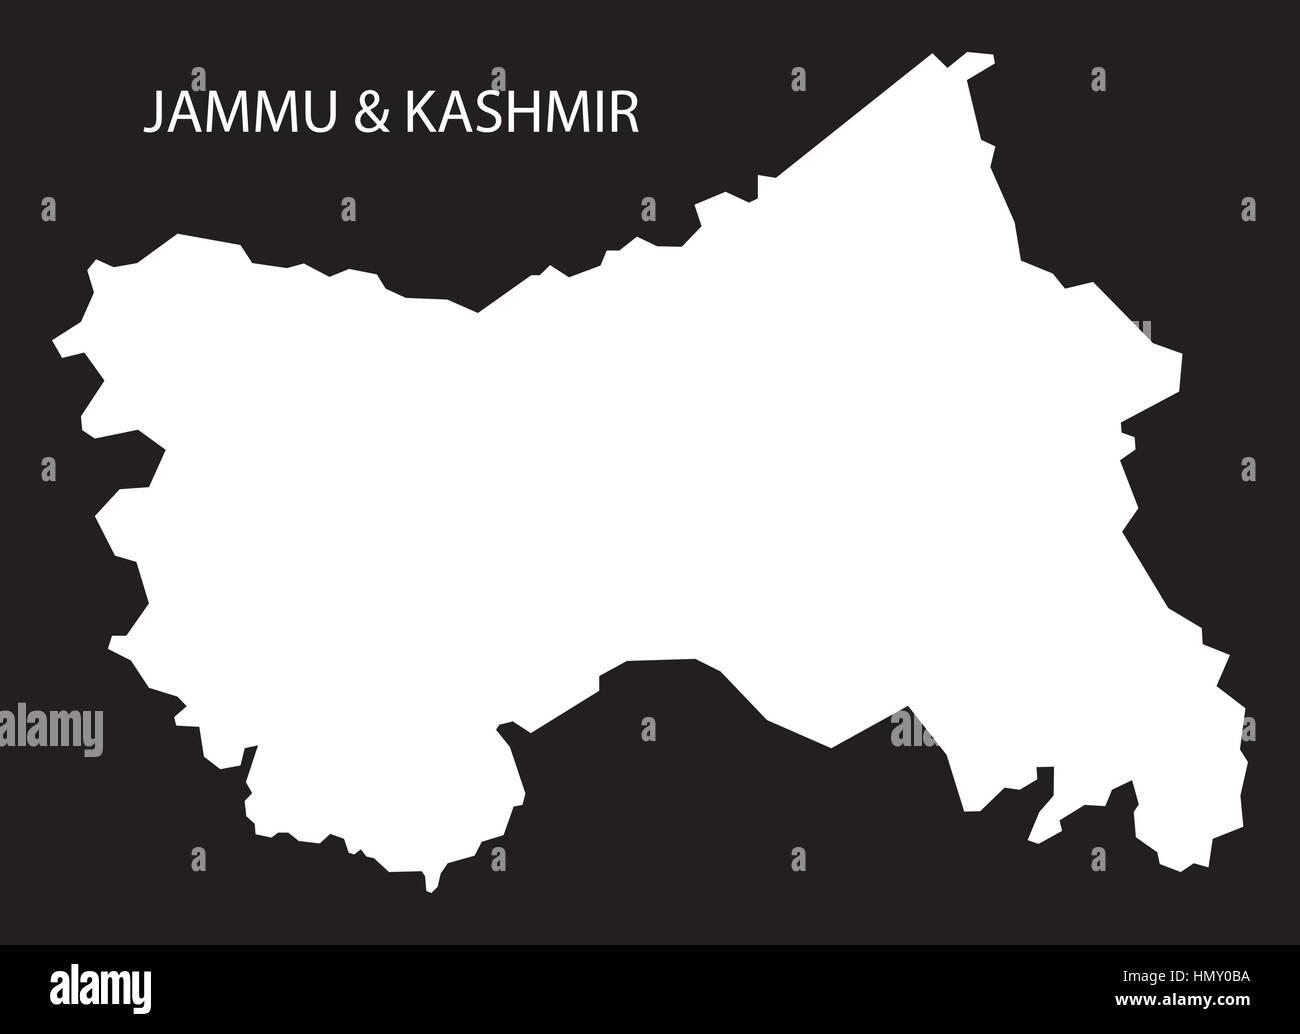 Jammu Kashmir India Map black inverted silhouette Stock Vector Art ...